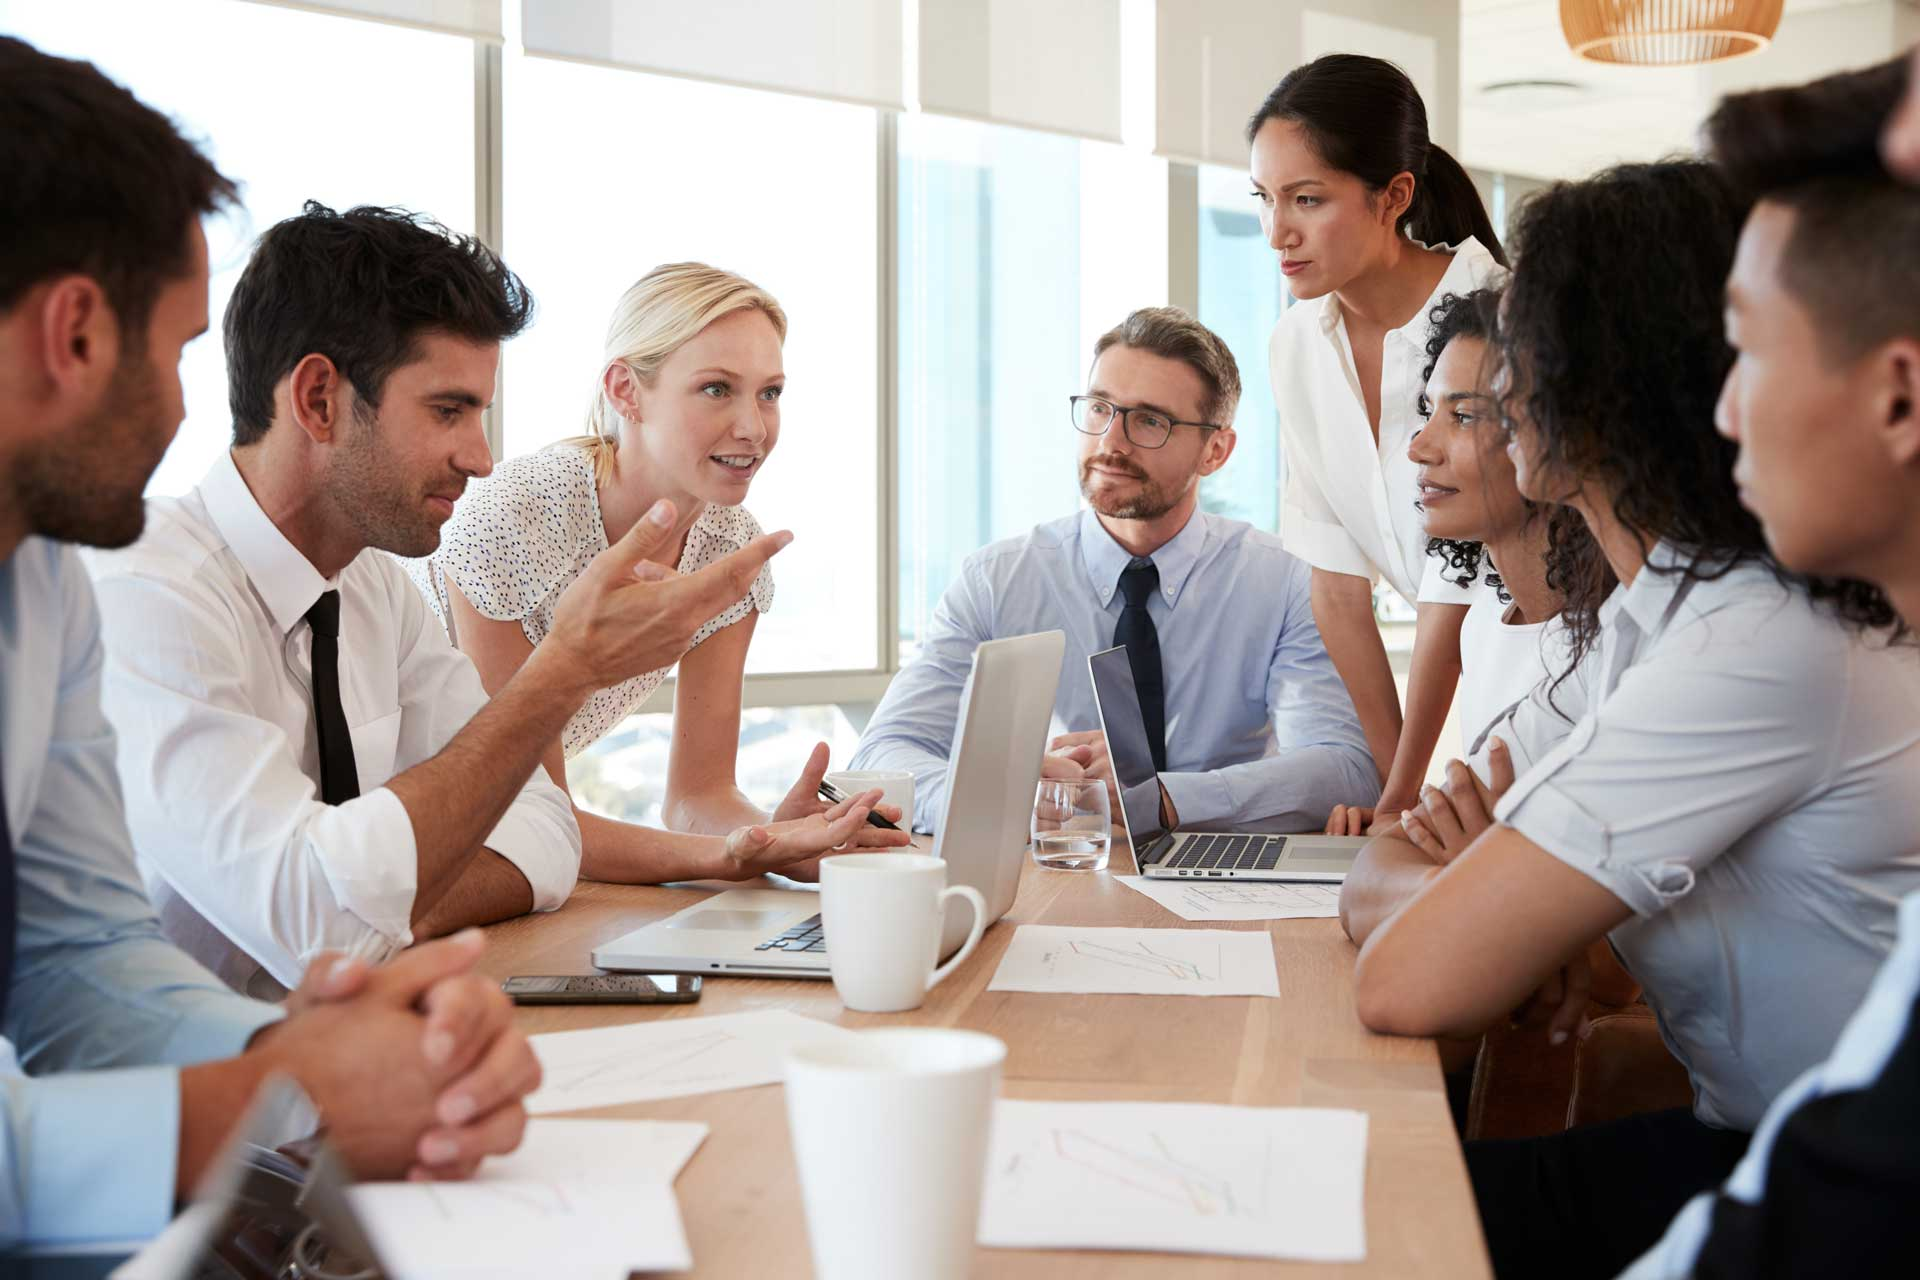 ACP X-tech Unternehmen Smart Workspace Digitaler Arbeitsplatz